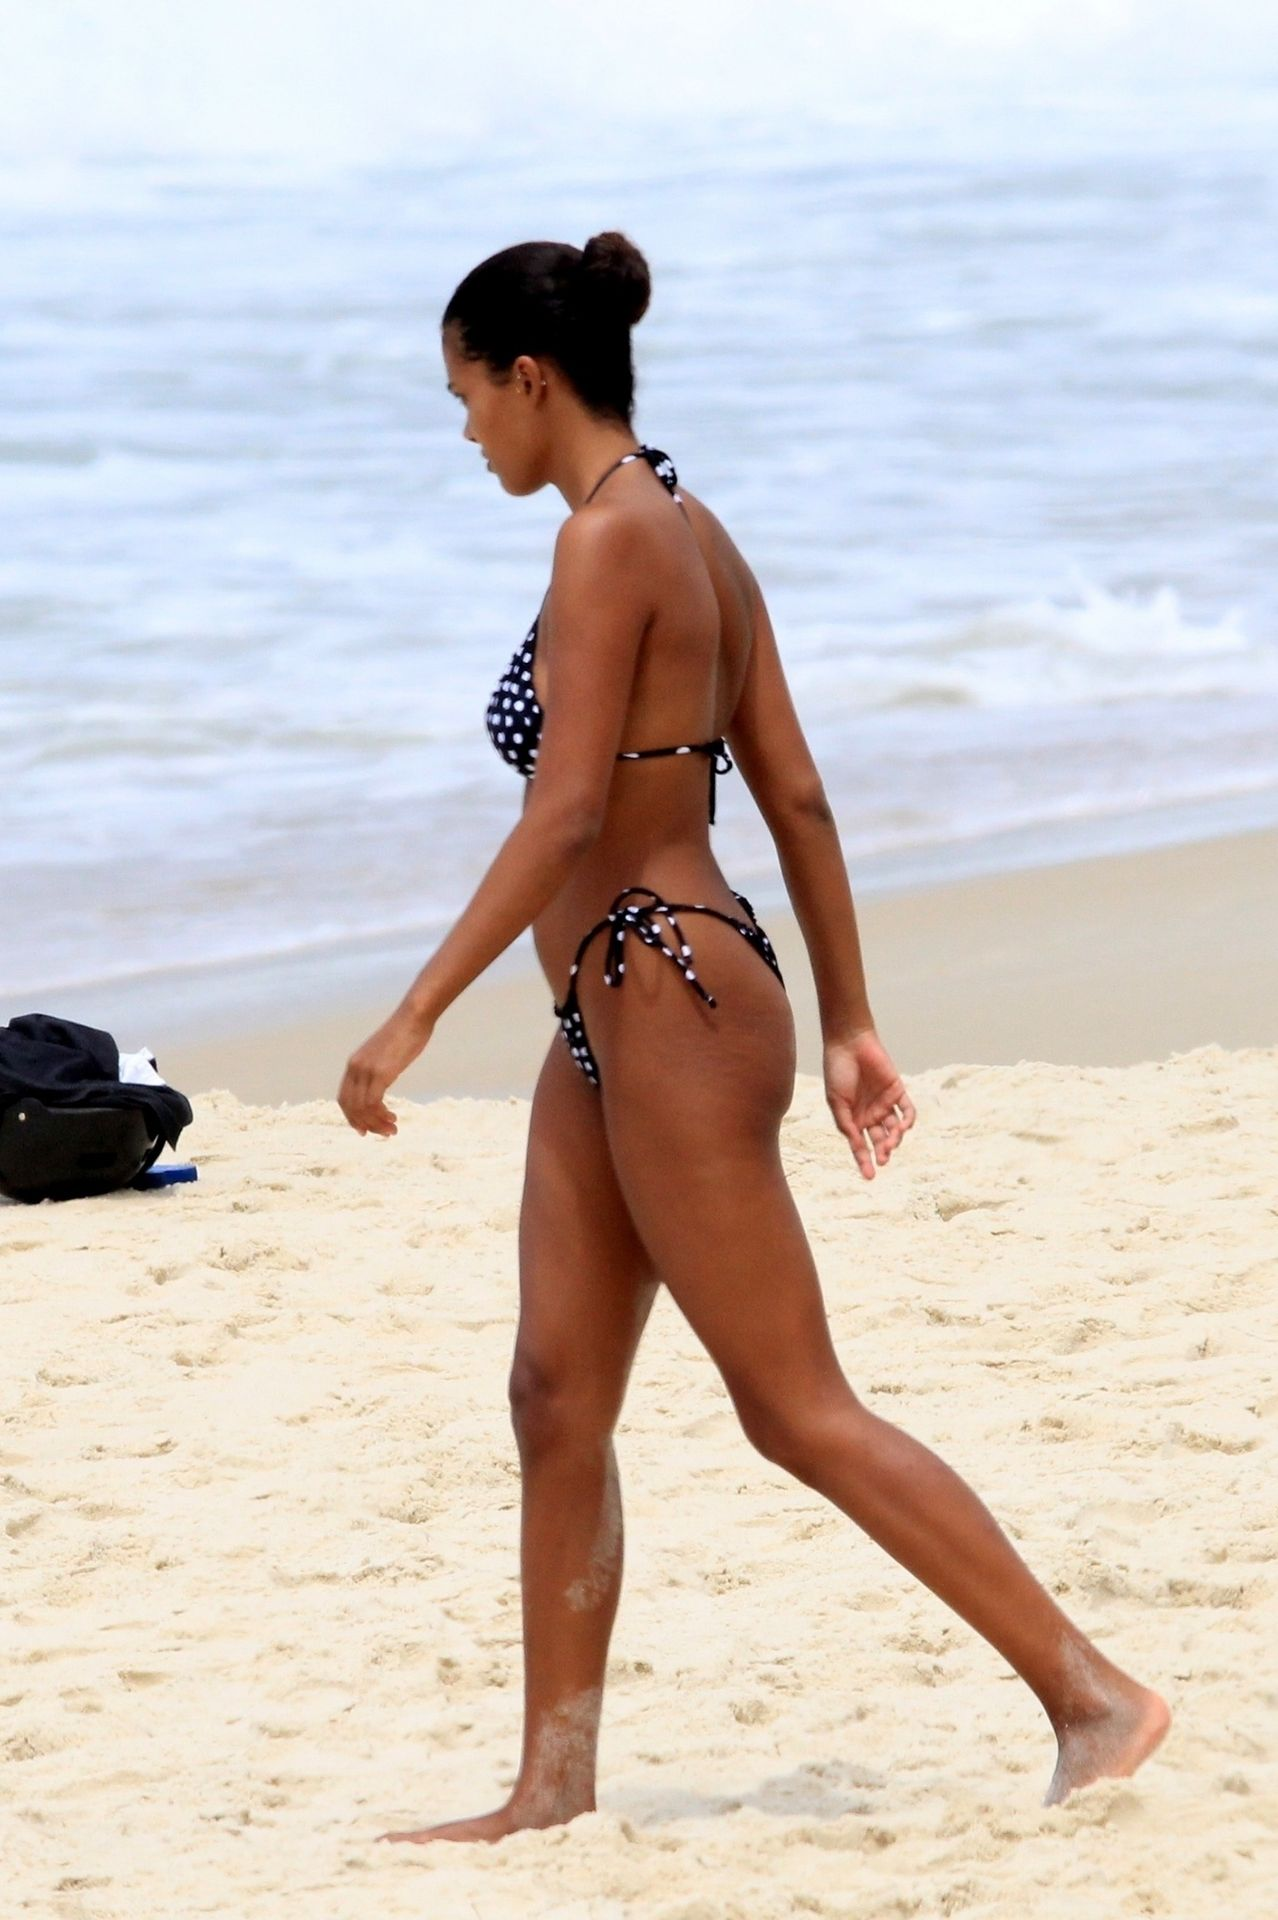 Tina Kunakey Nearly Nip Slip While Frolicking On The Beach In Rio 0057